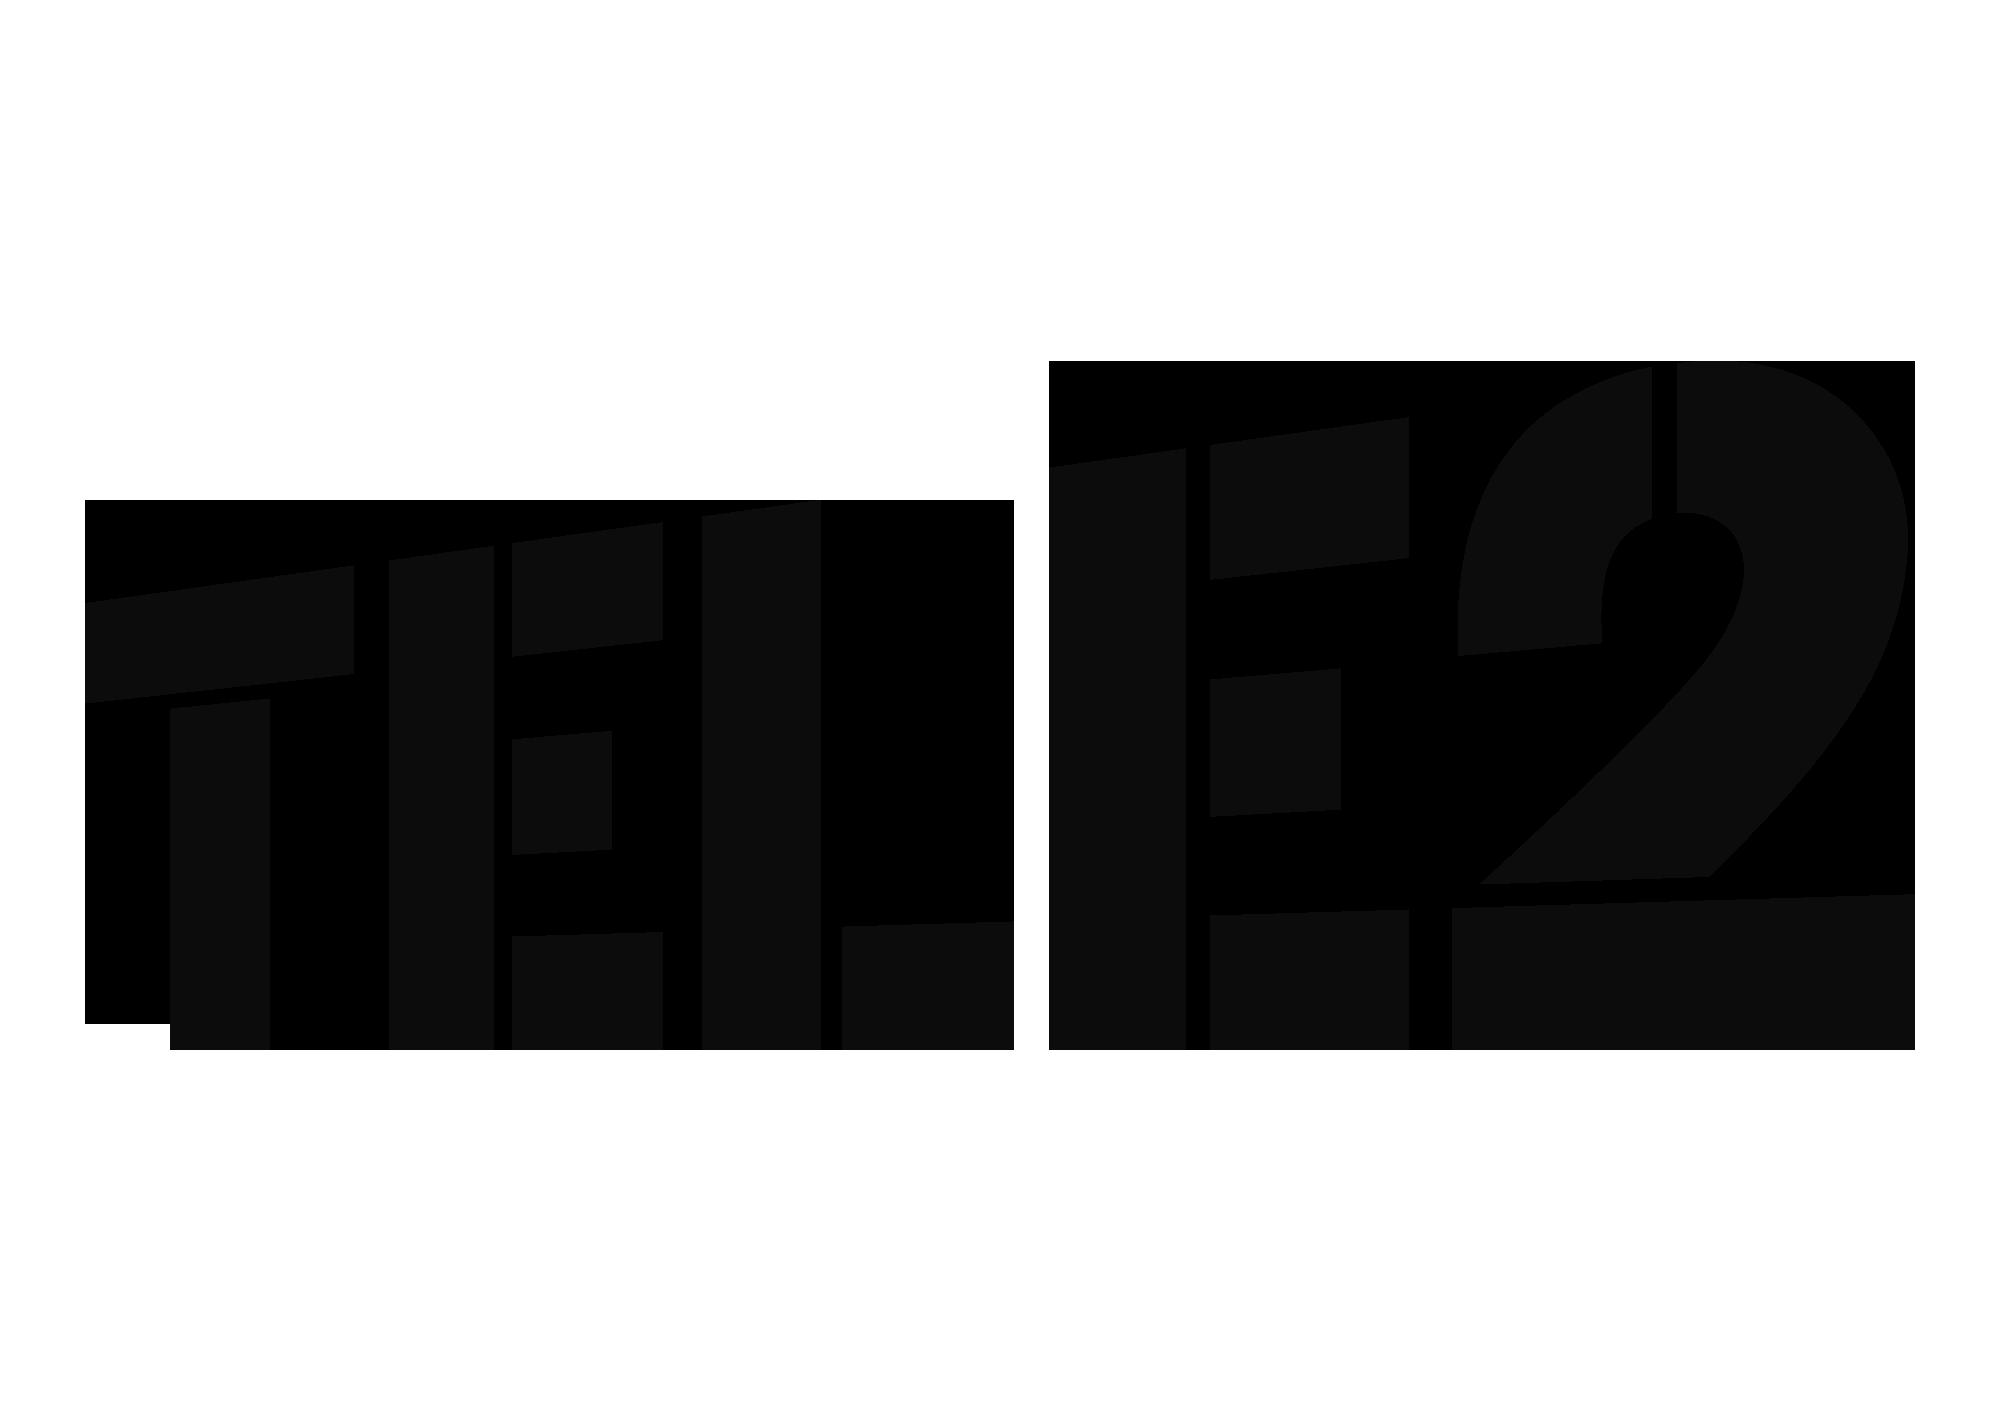 Logo Tele2 (telefonie provider)